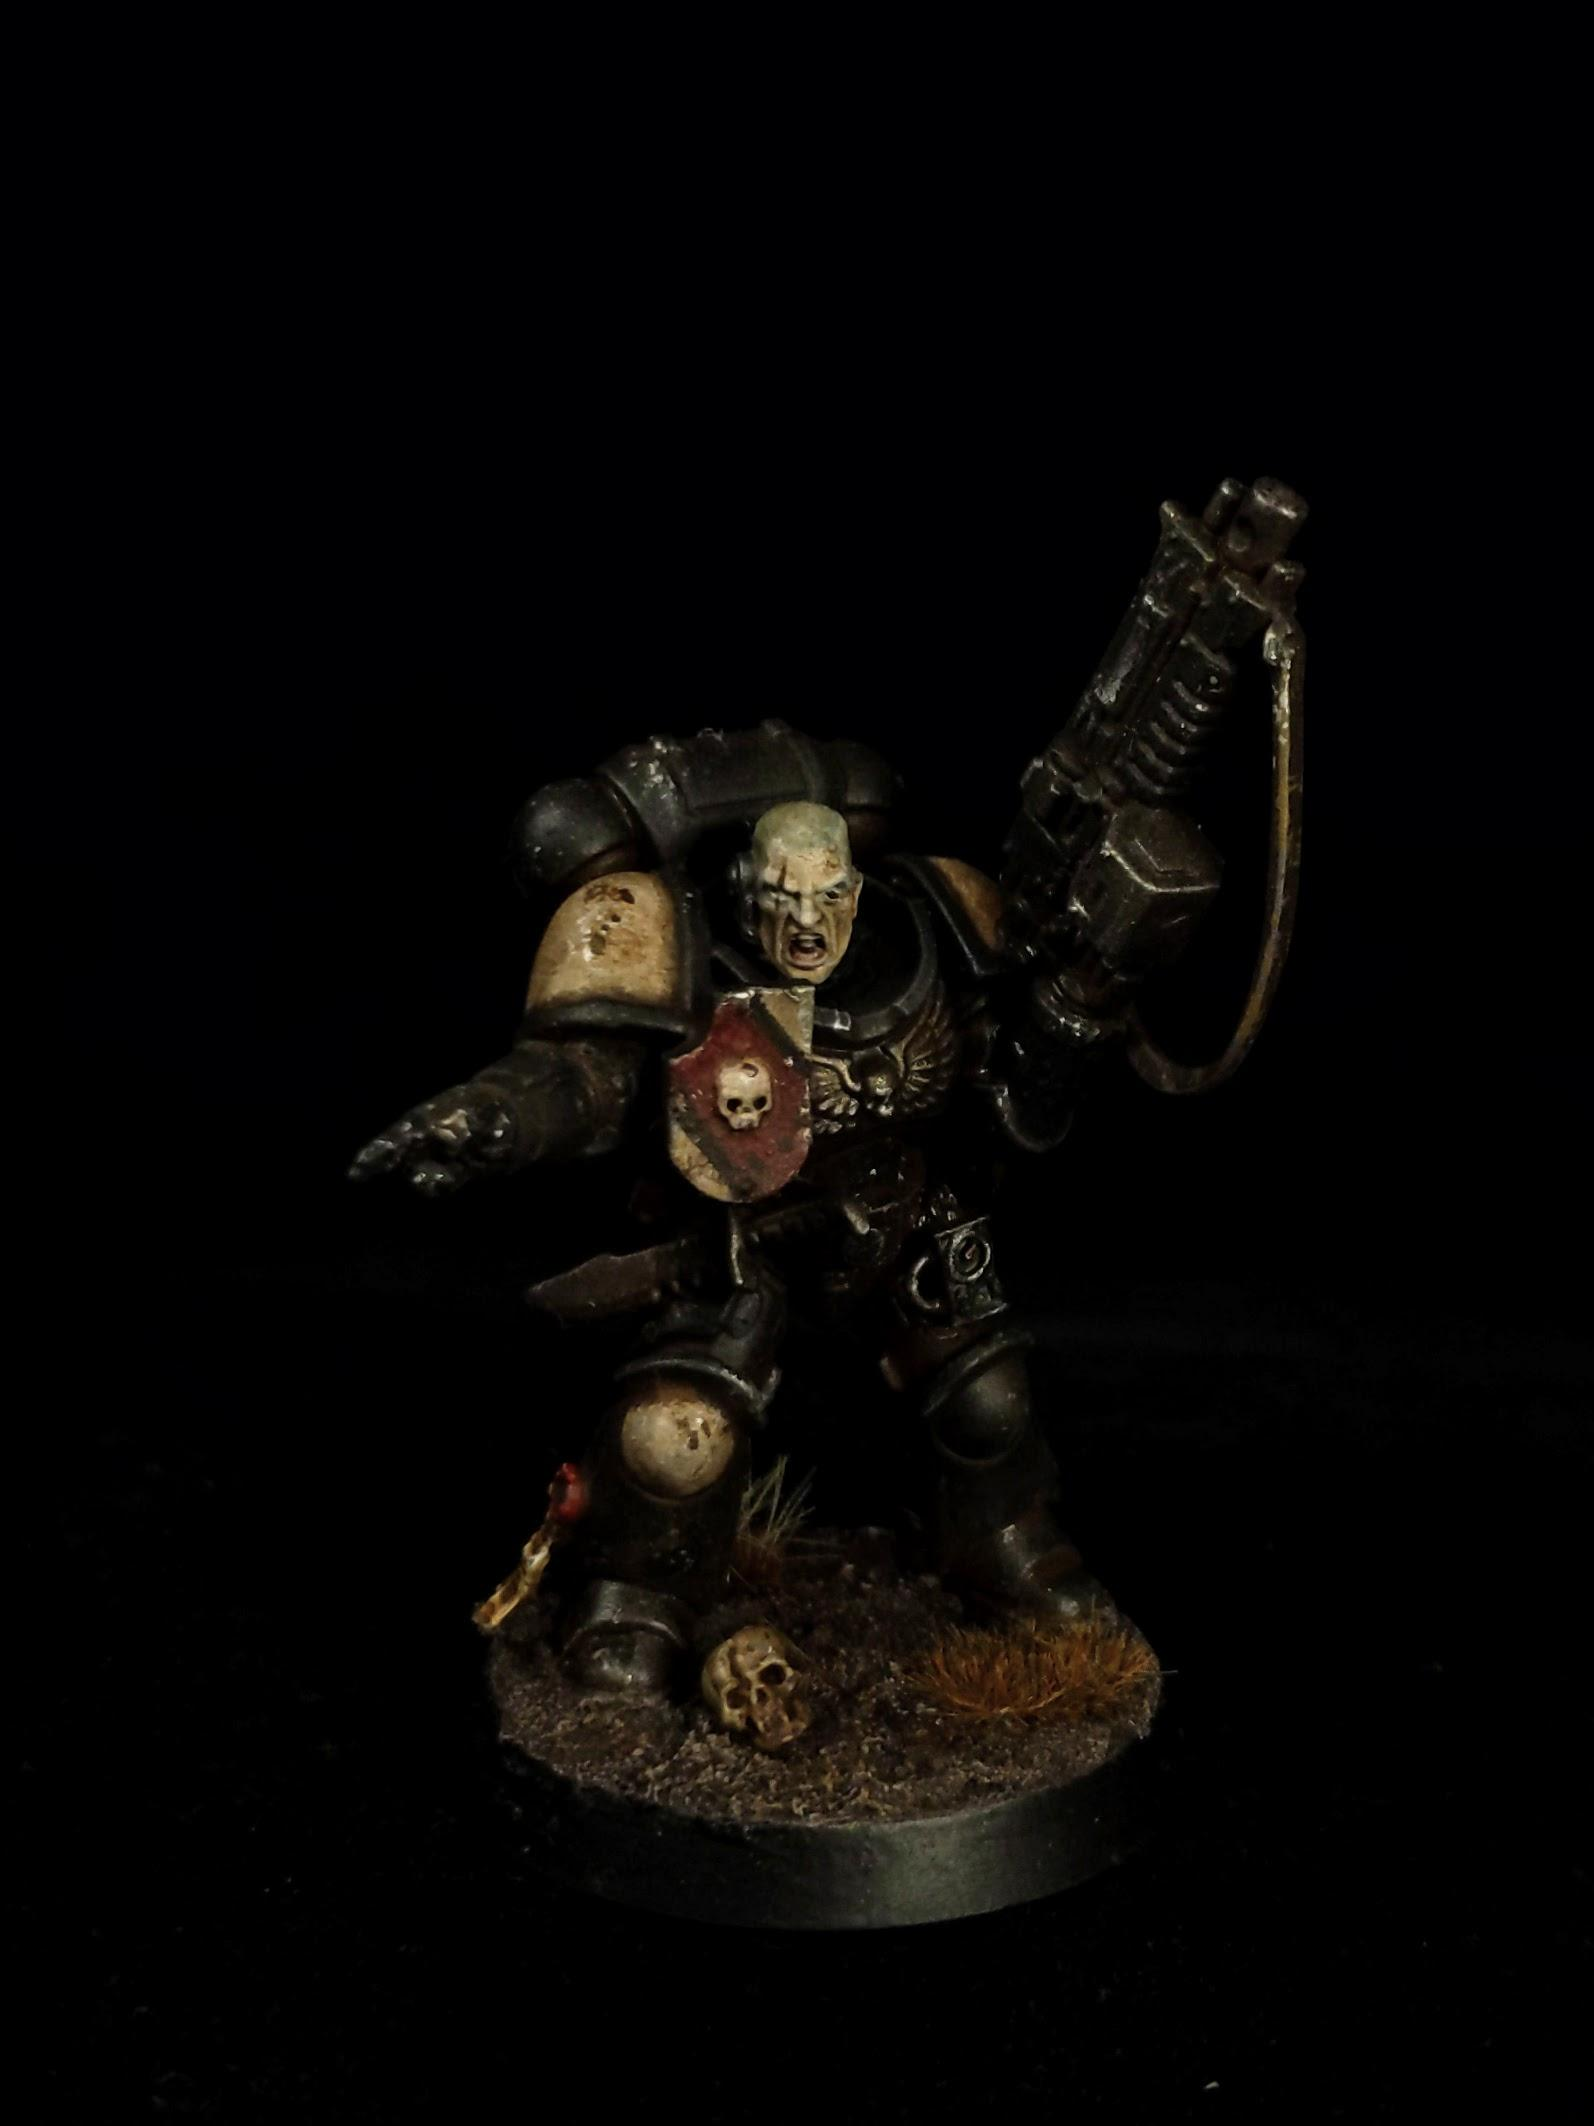 Black Templars, Grim Dark, Grimdark, Stubble, Turqouise